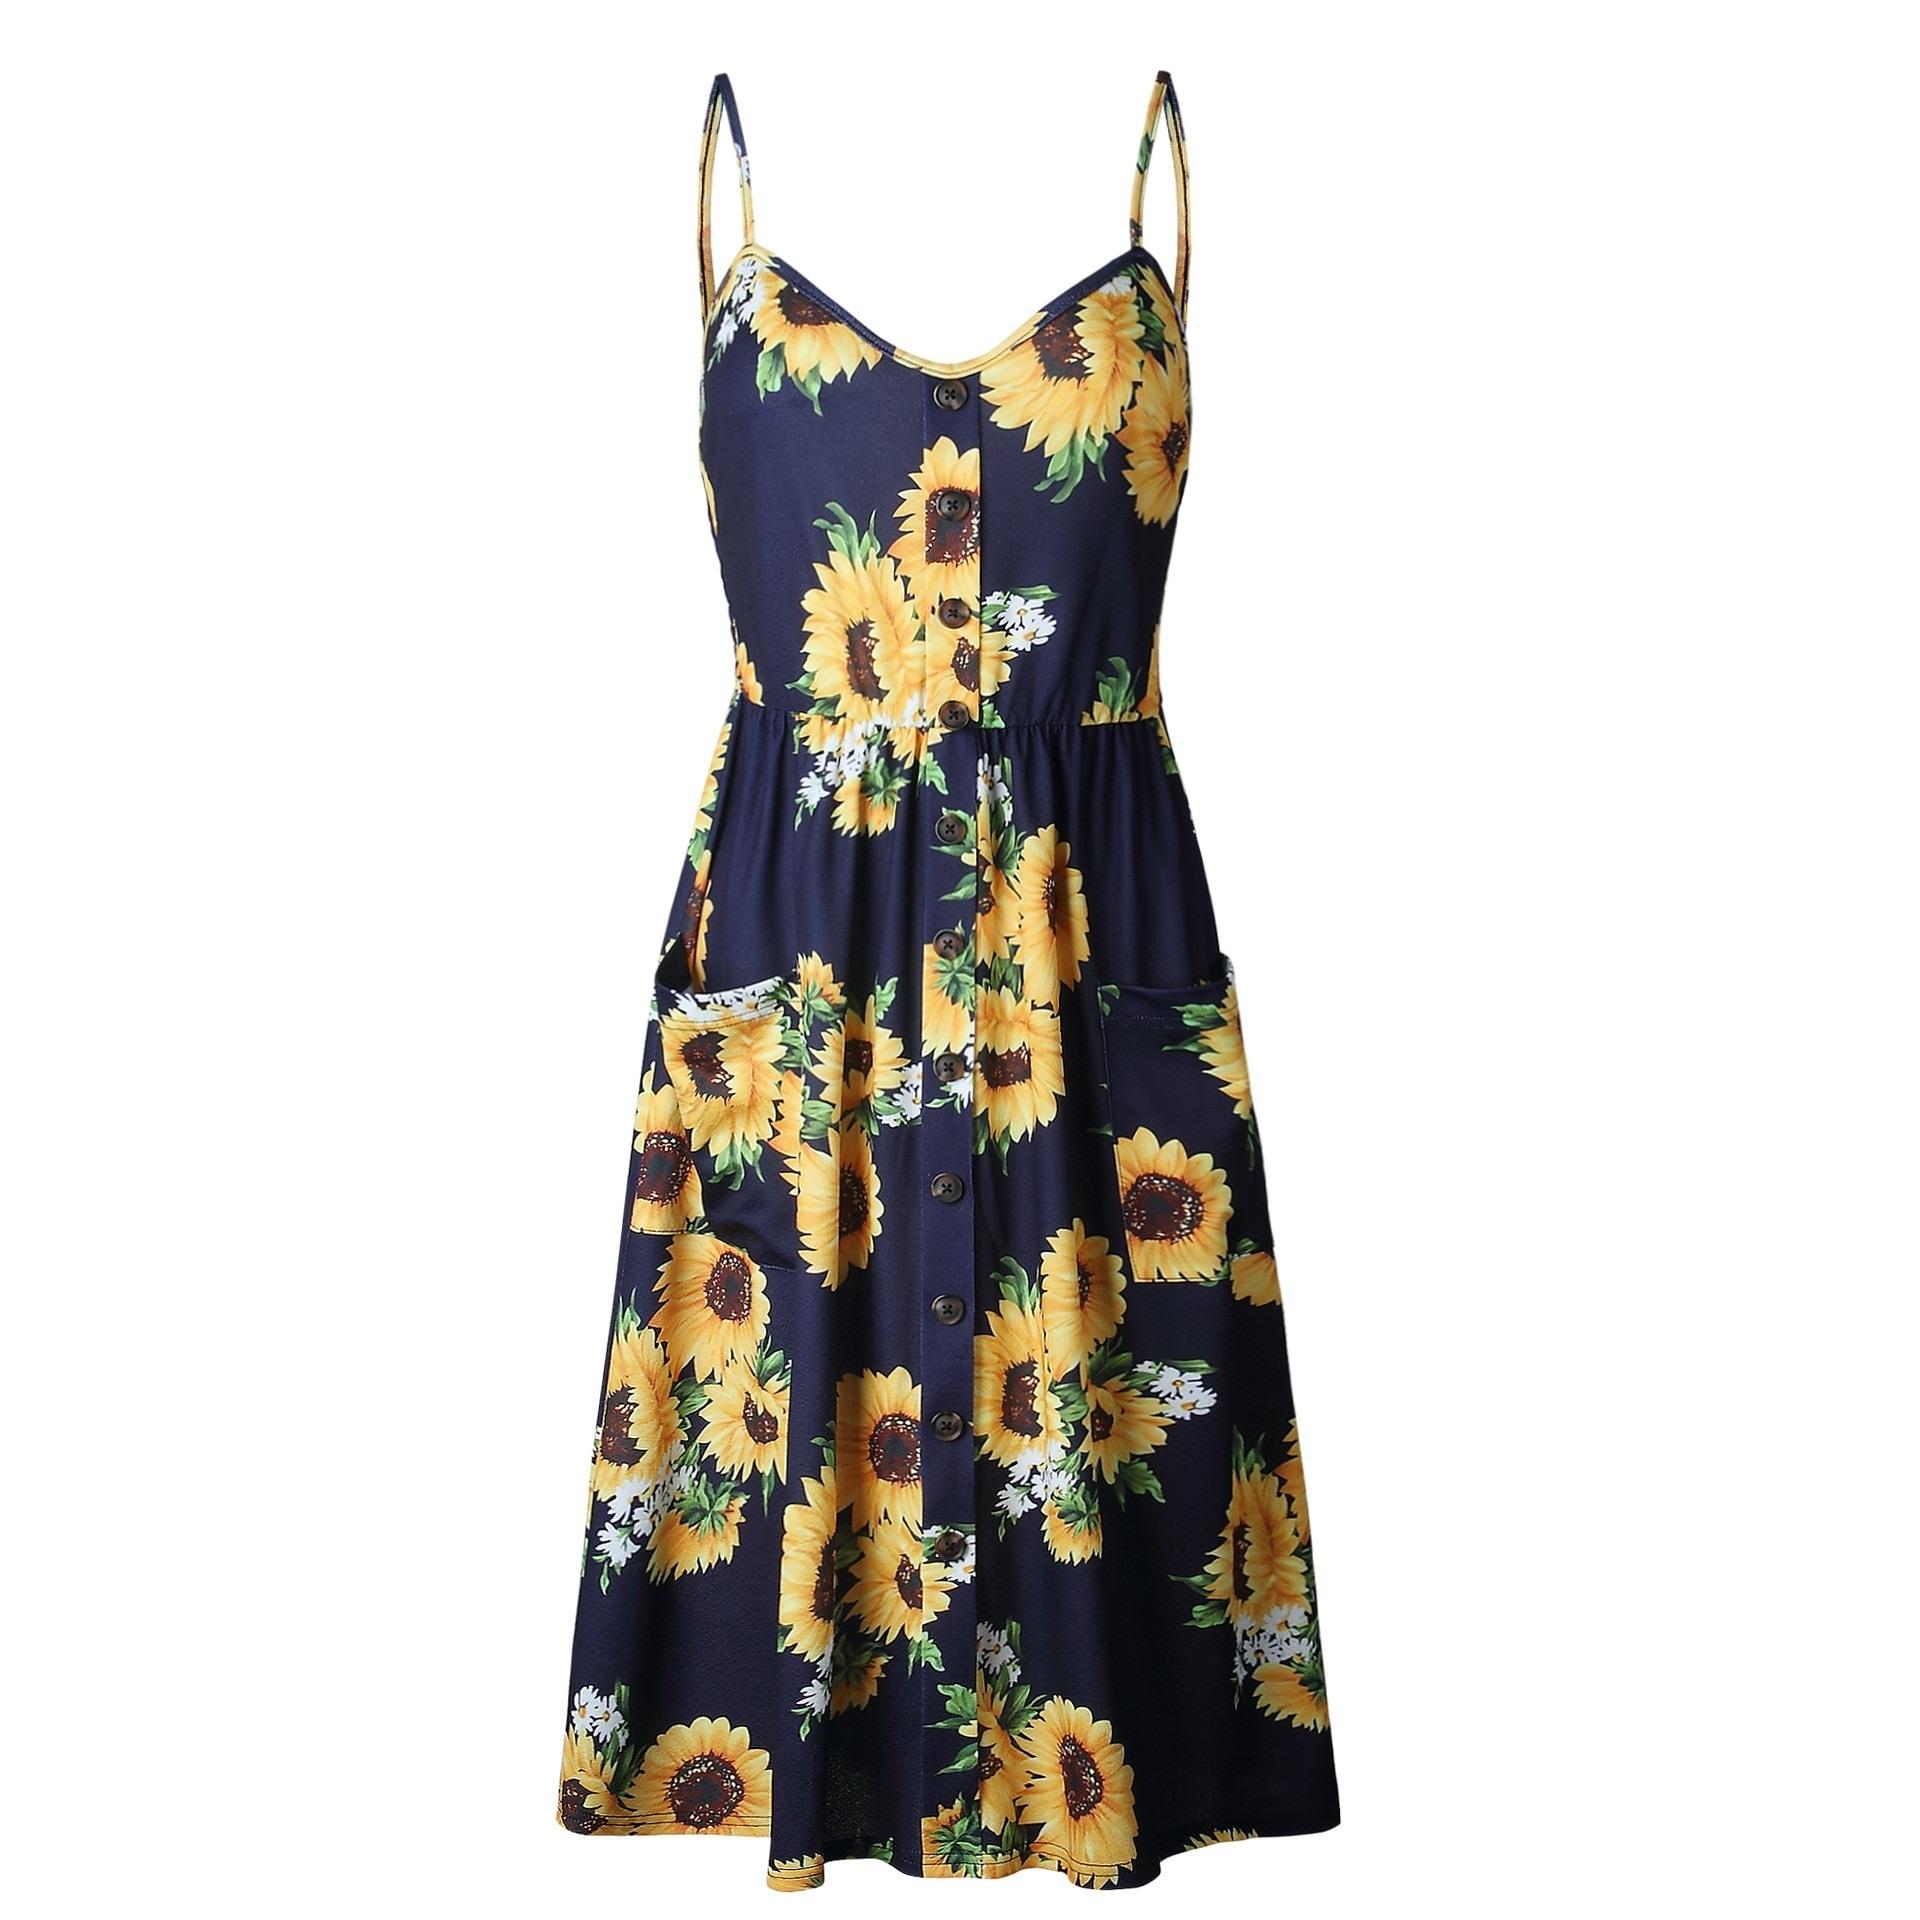 Leicht Kleid Lang Blumen Design20 Großartig Kleid Lang Blumen Spezialgebiet